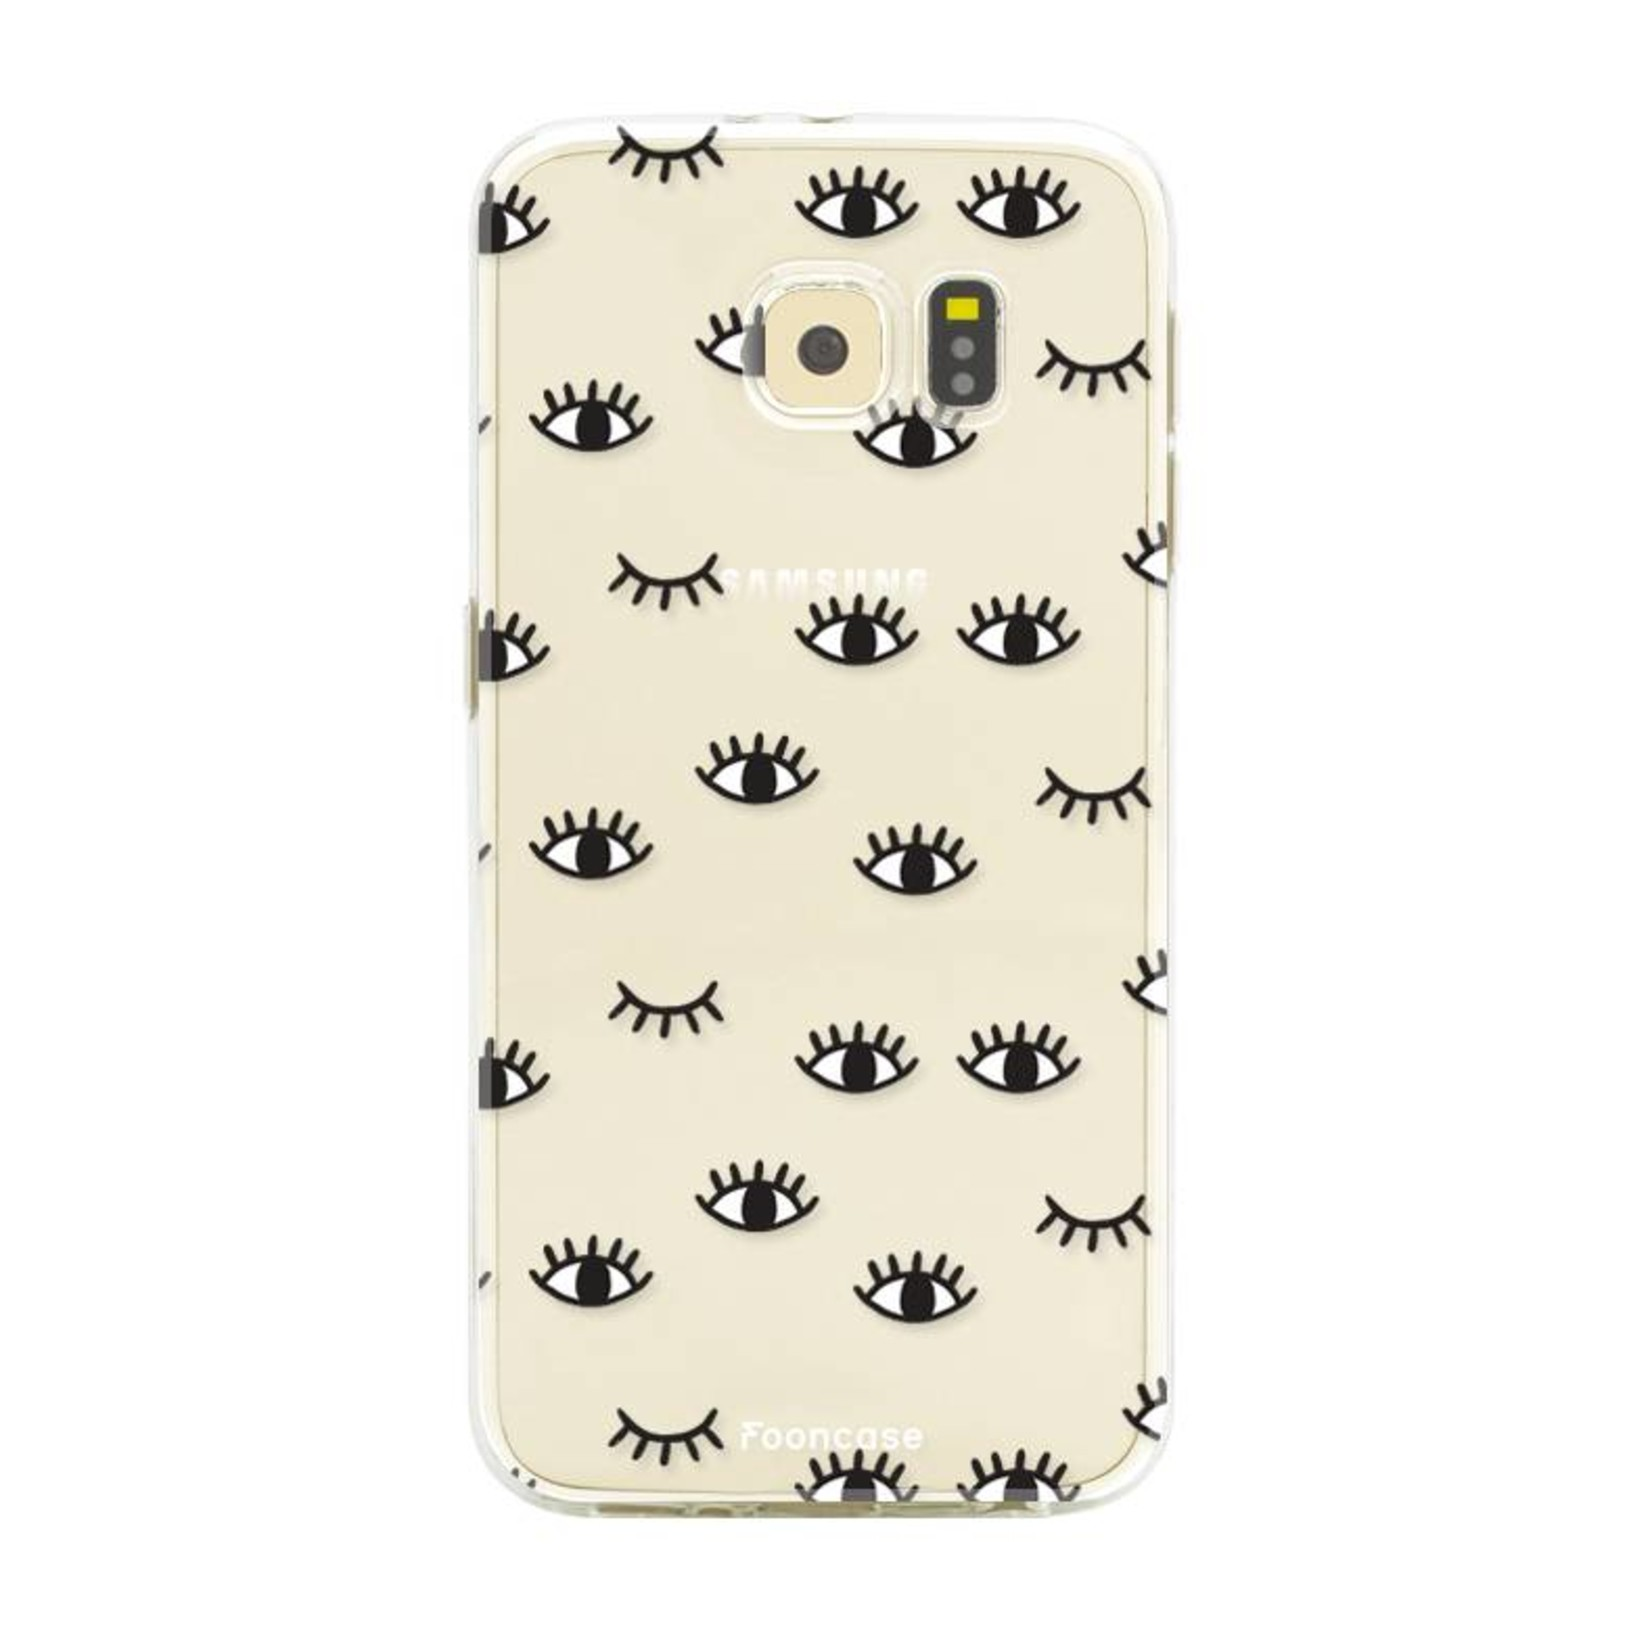 FOONCASE Samsung Galaxy S6 hoesje TPU Soft Case - Back Cover - Eyes / Ogen